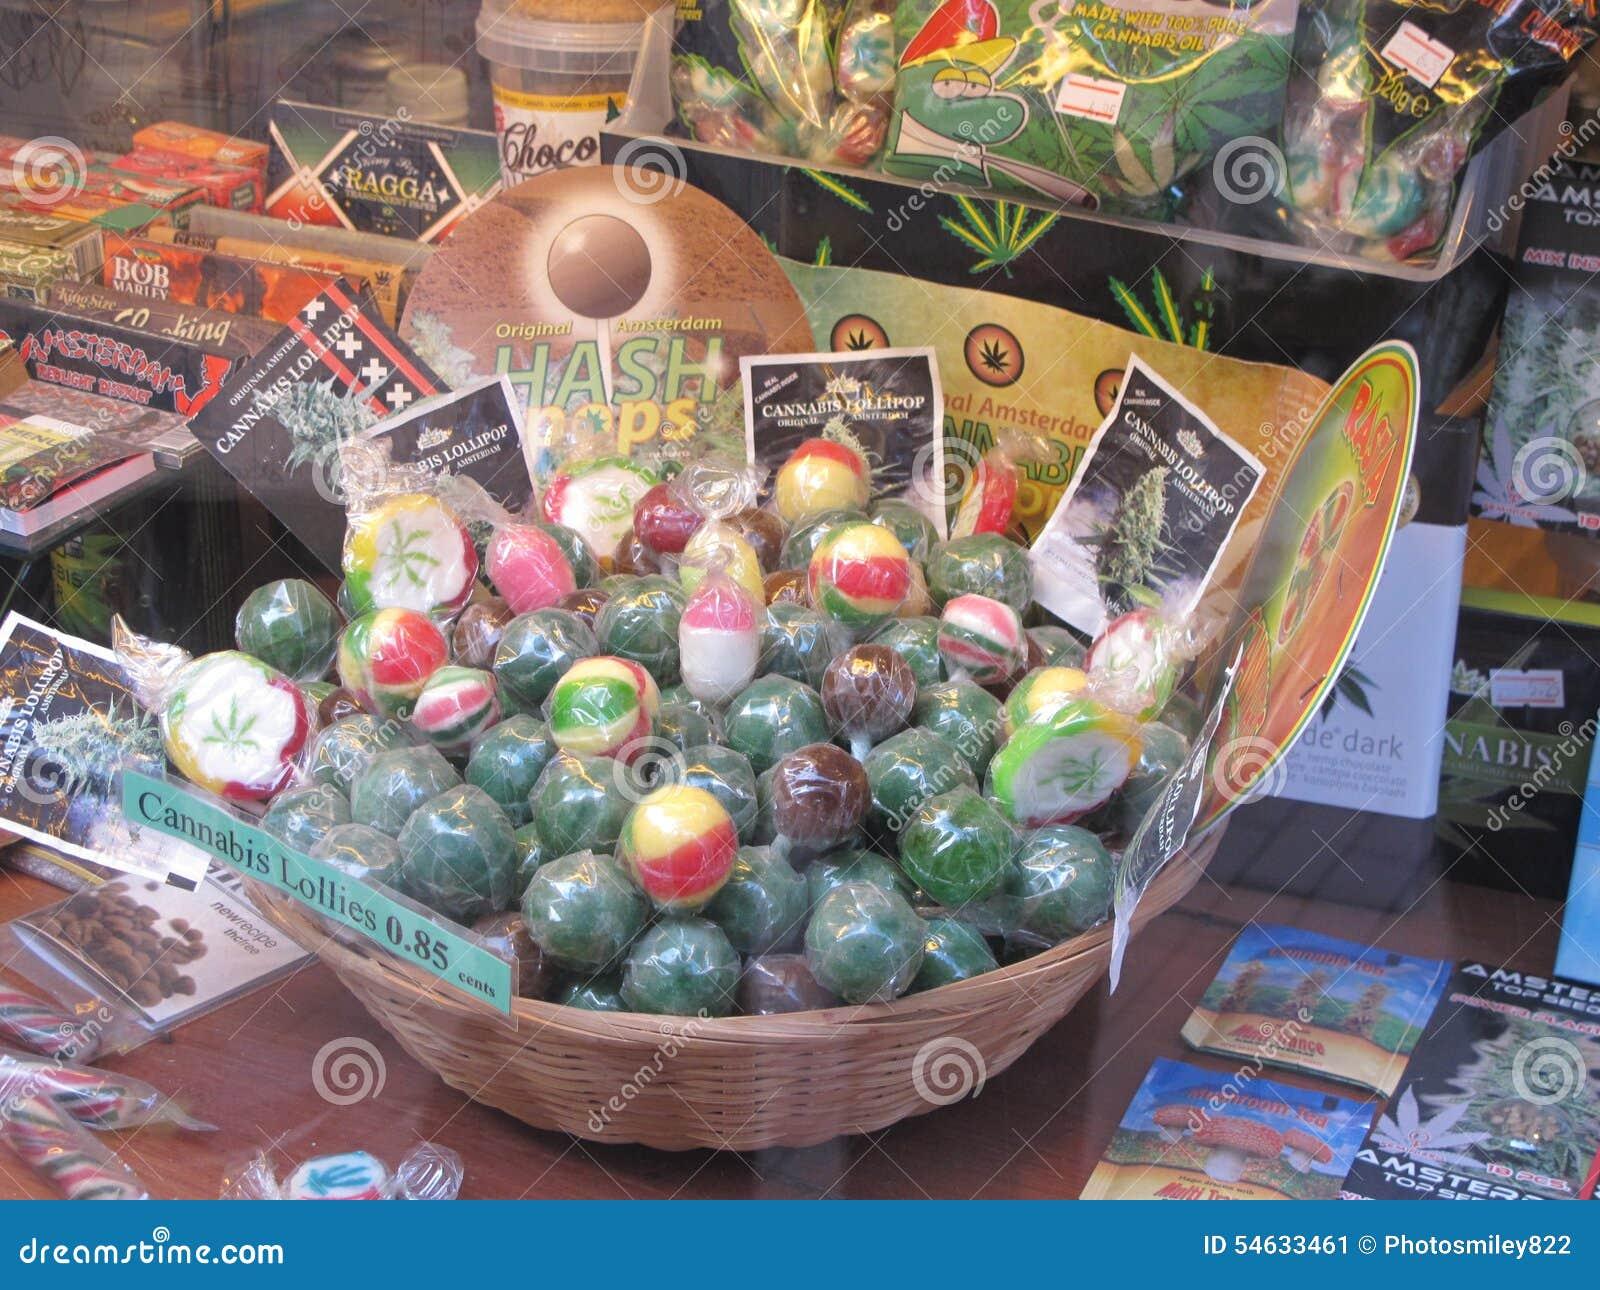 Конфетки из конопли марихуана выращивание семенами